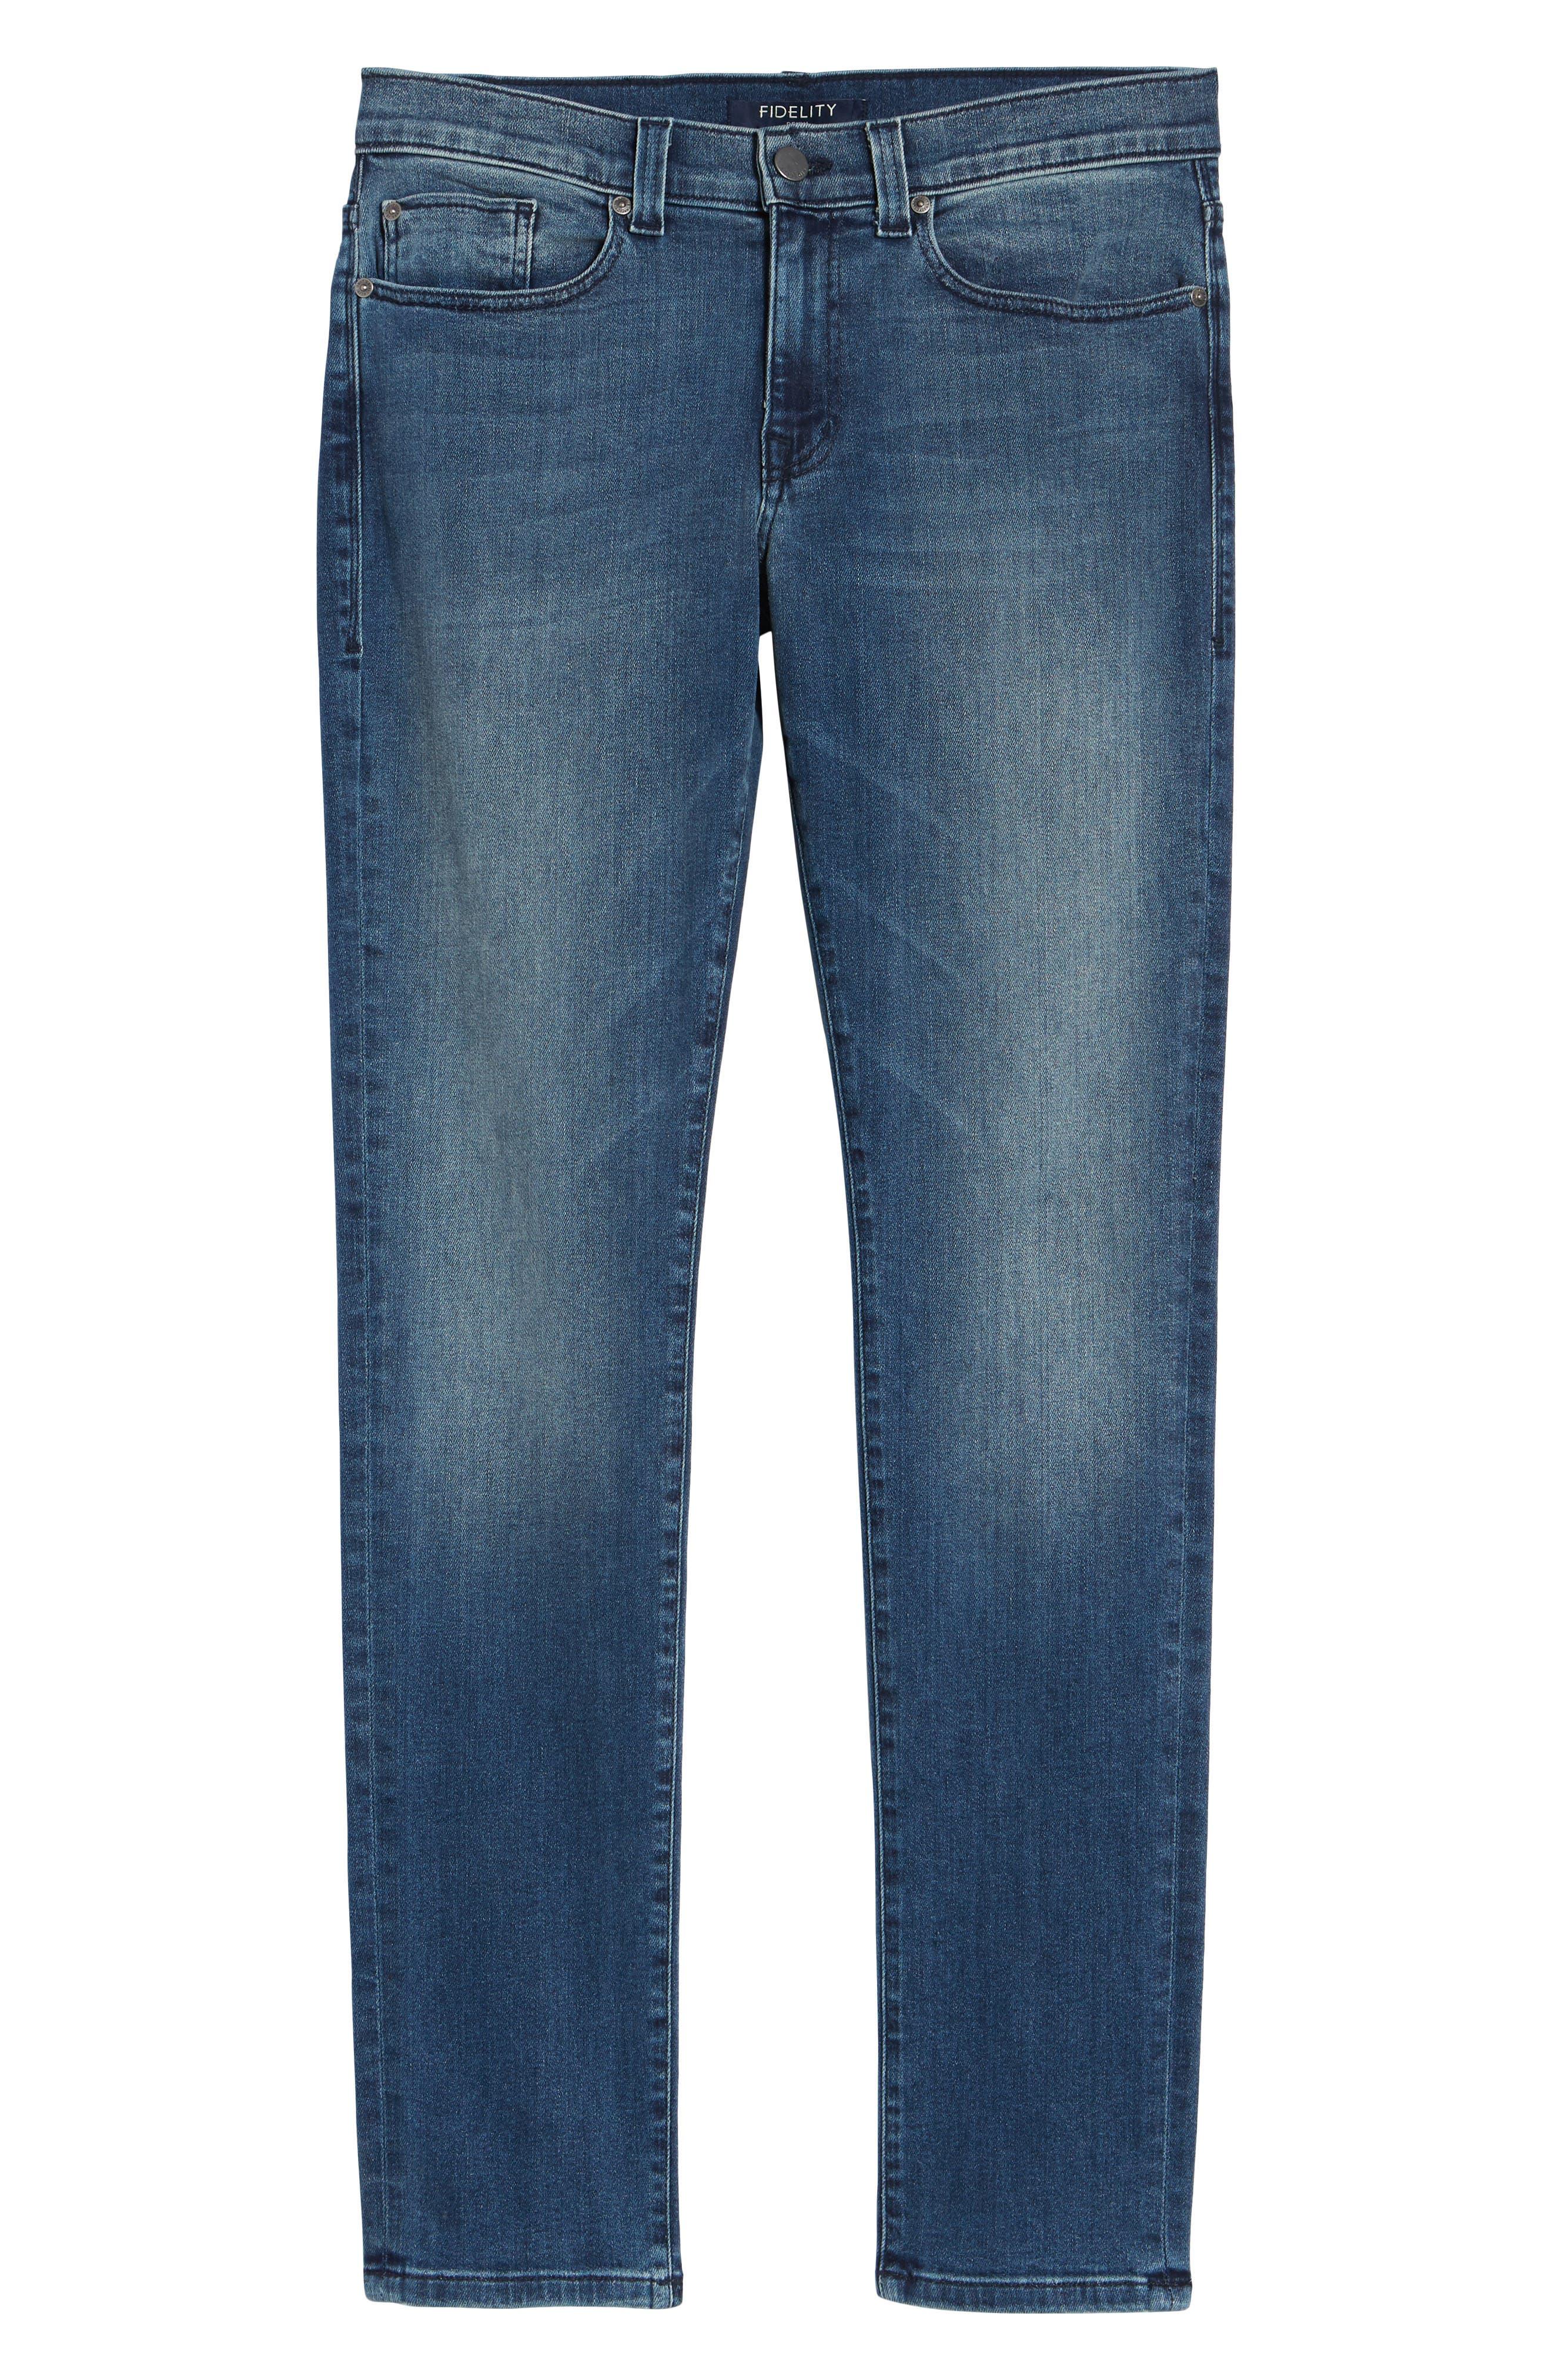 Torino Slim Fit Jeans,                             Alternate thumbnail 6, color,                             EMPIRE BLUE